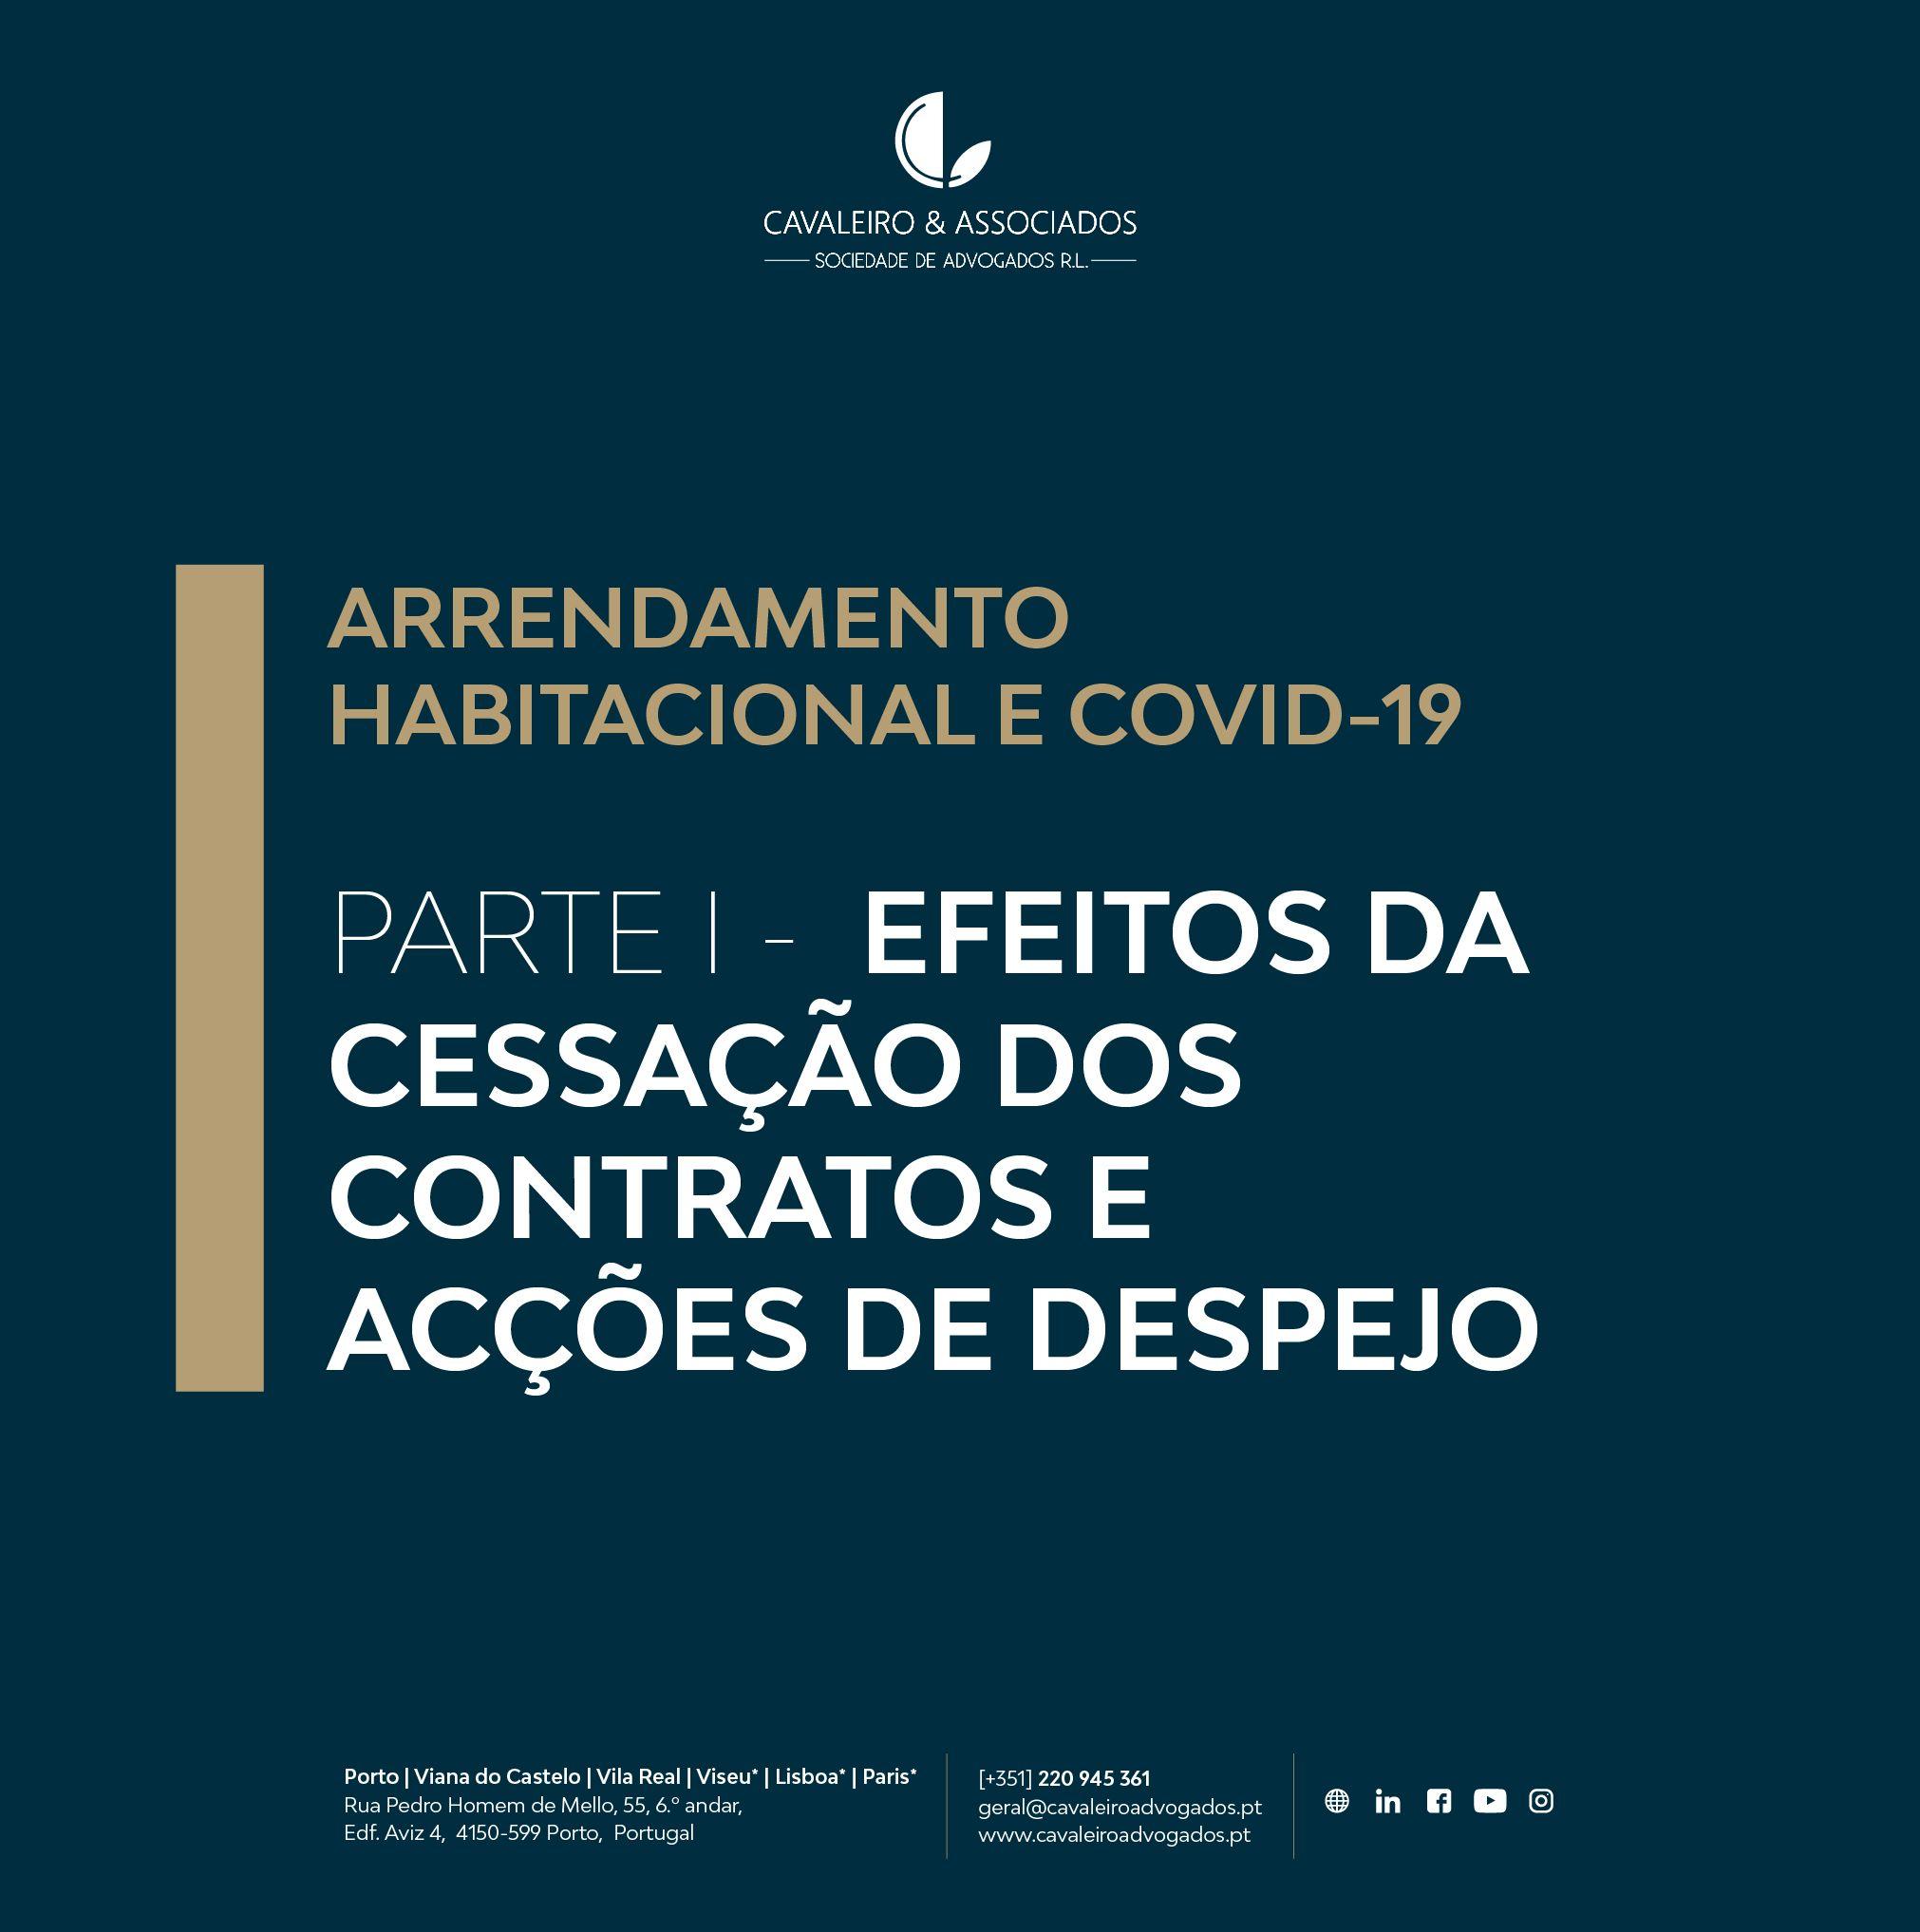 ARRENDAMENTO HABITACIONAL E COVID-19 PARTE 1